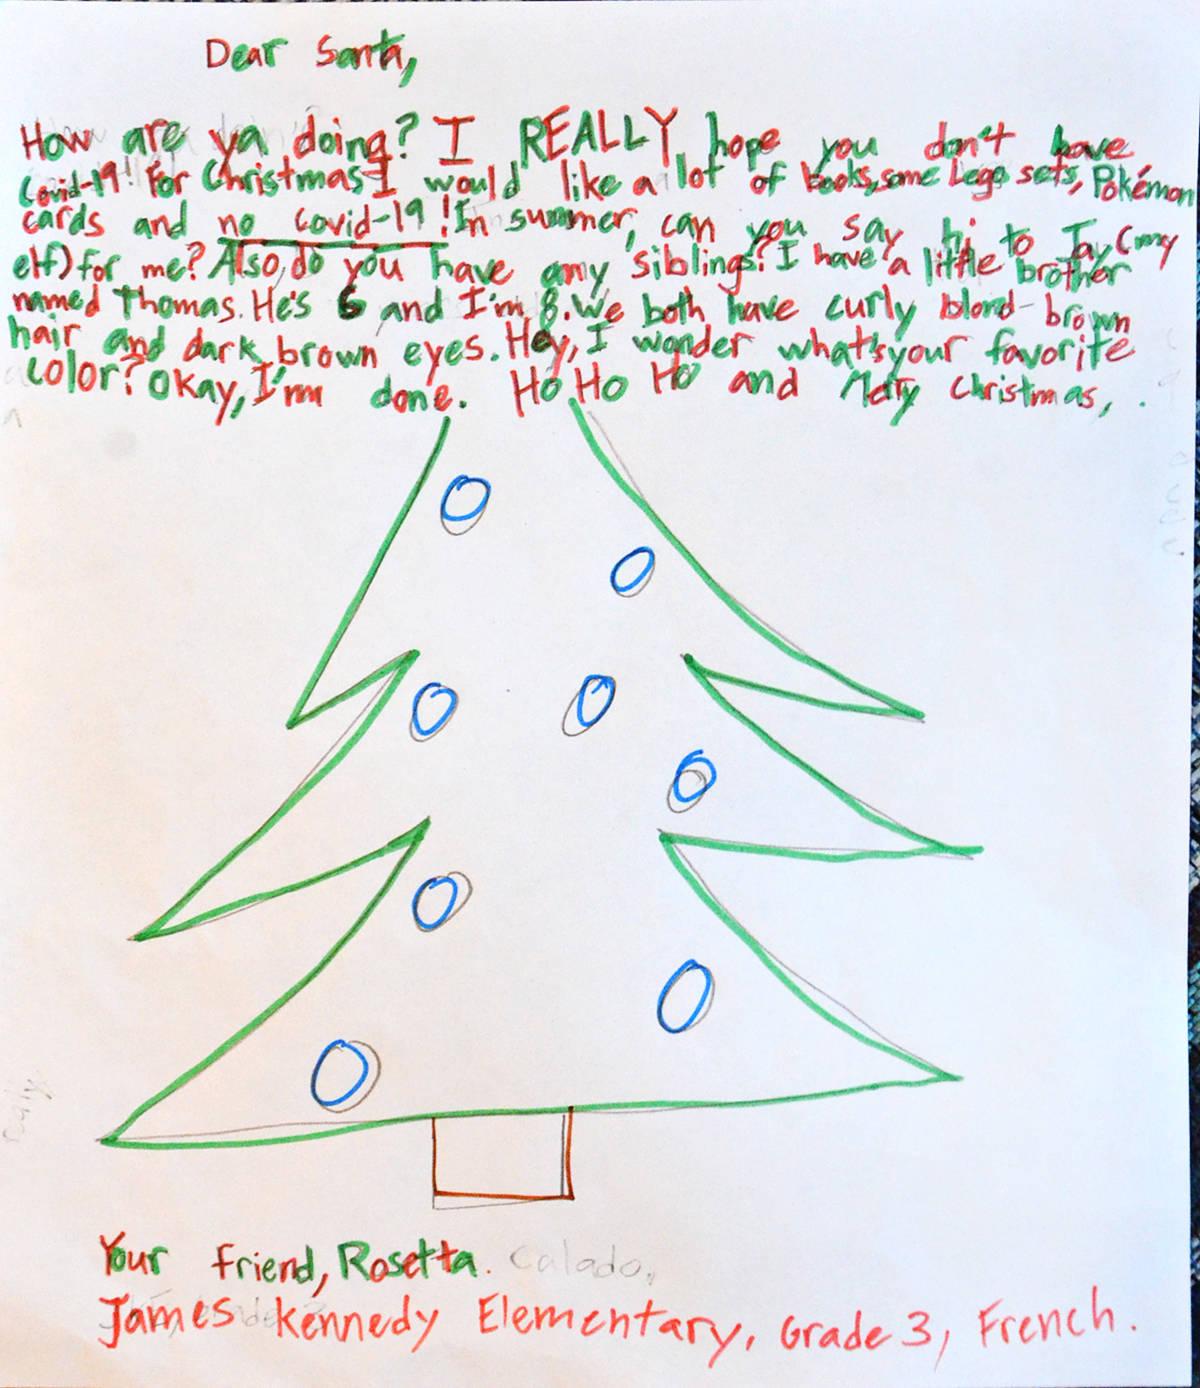 Rosetta, Grade 3, James Kennedy Elementary